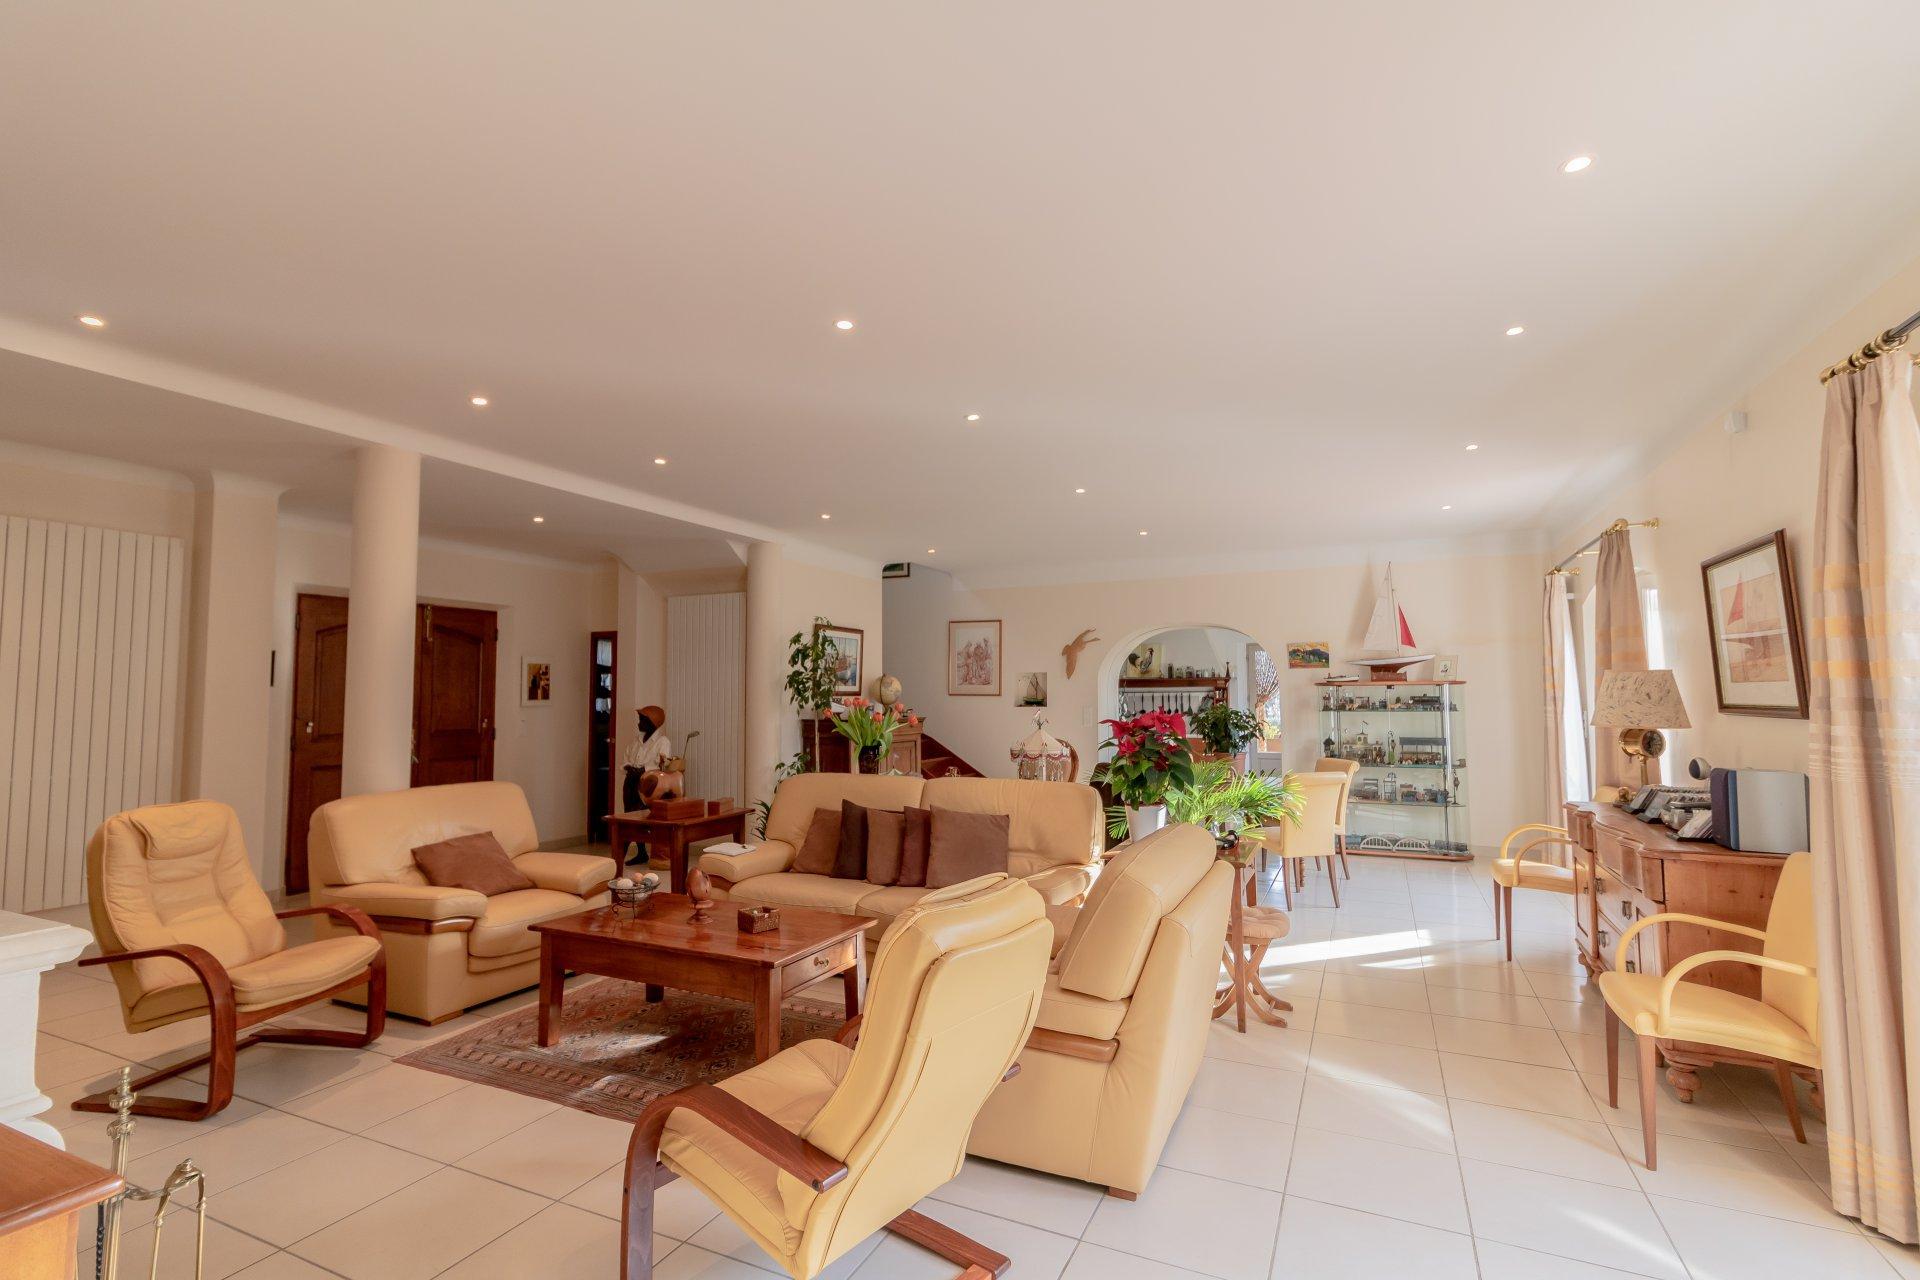 Draguigan, 2 new villas,  pool, garages